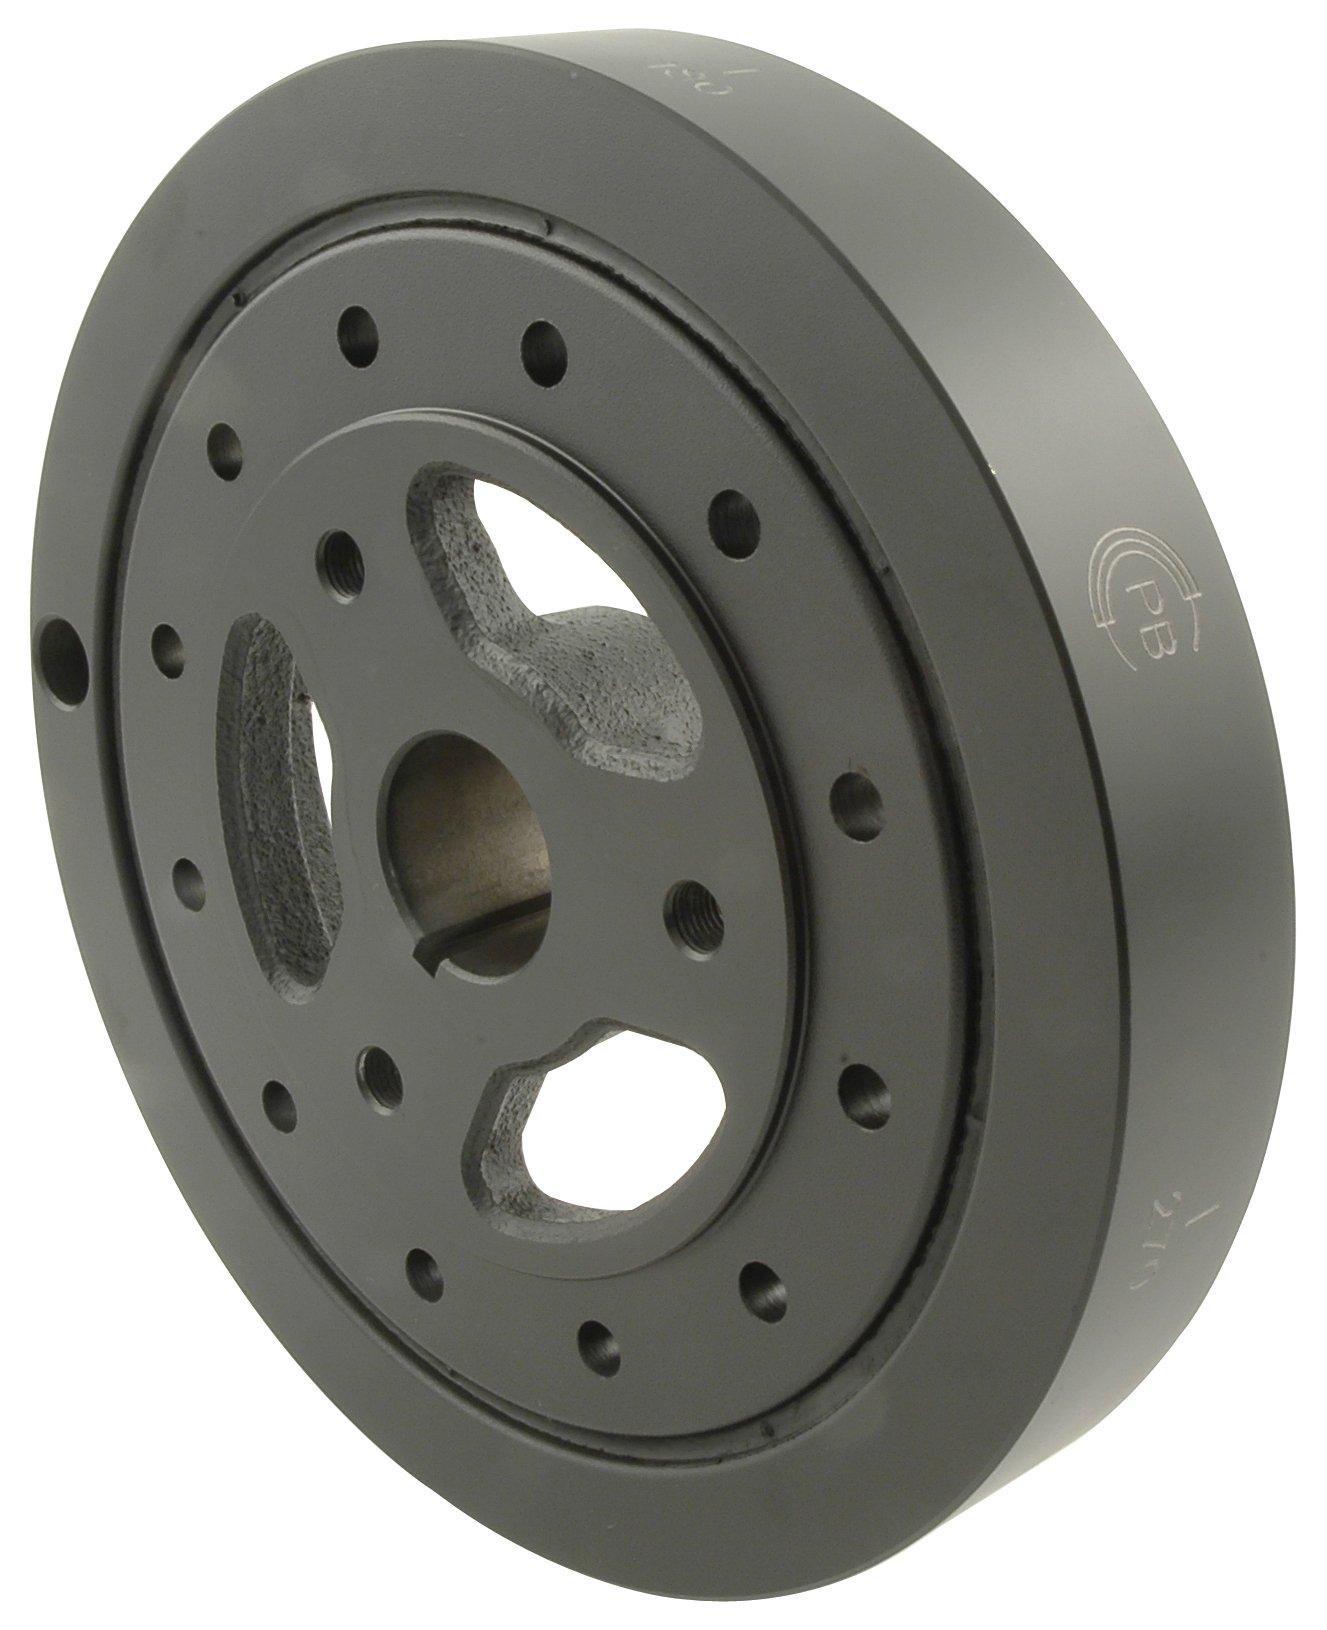 Powerbond Balancers PBU1117-SS25 6.75'' SFI Approved Steel Harmonic Balancer for Small Block Chevy